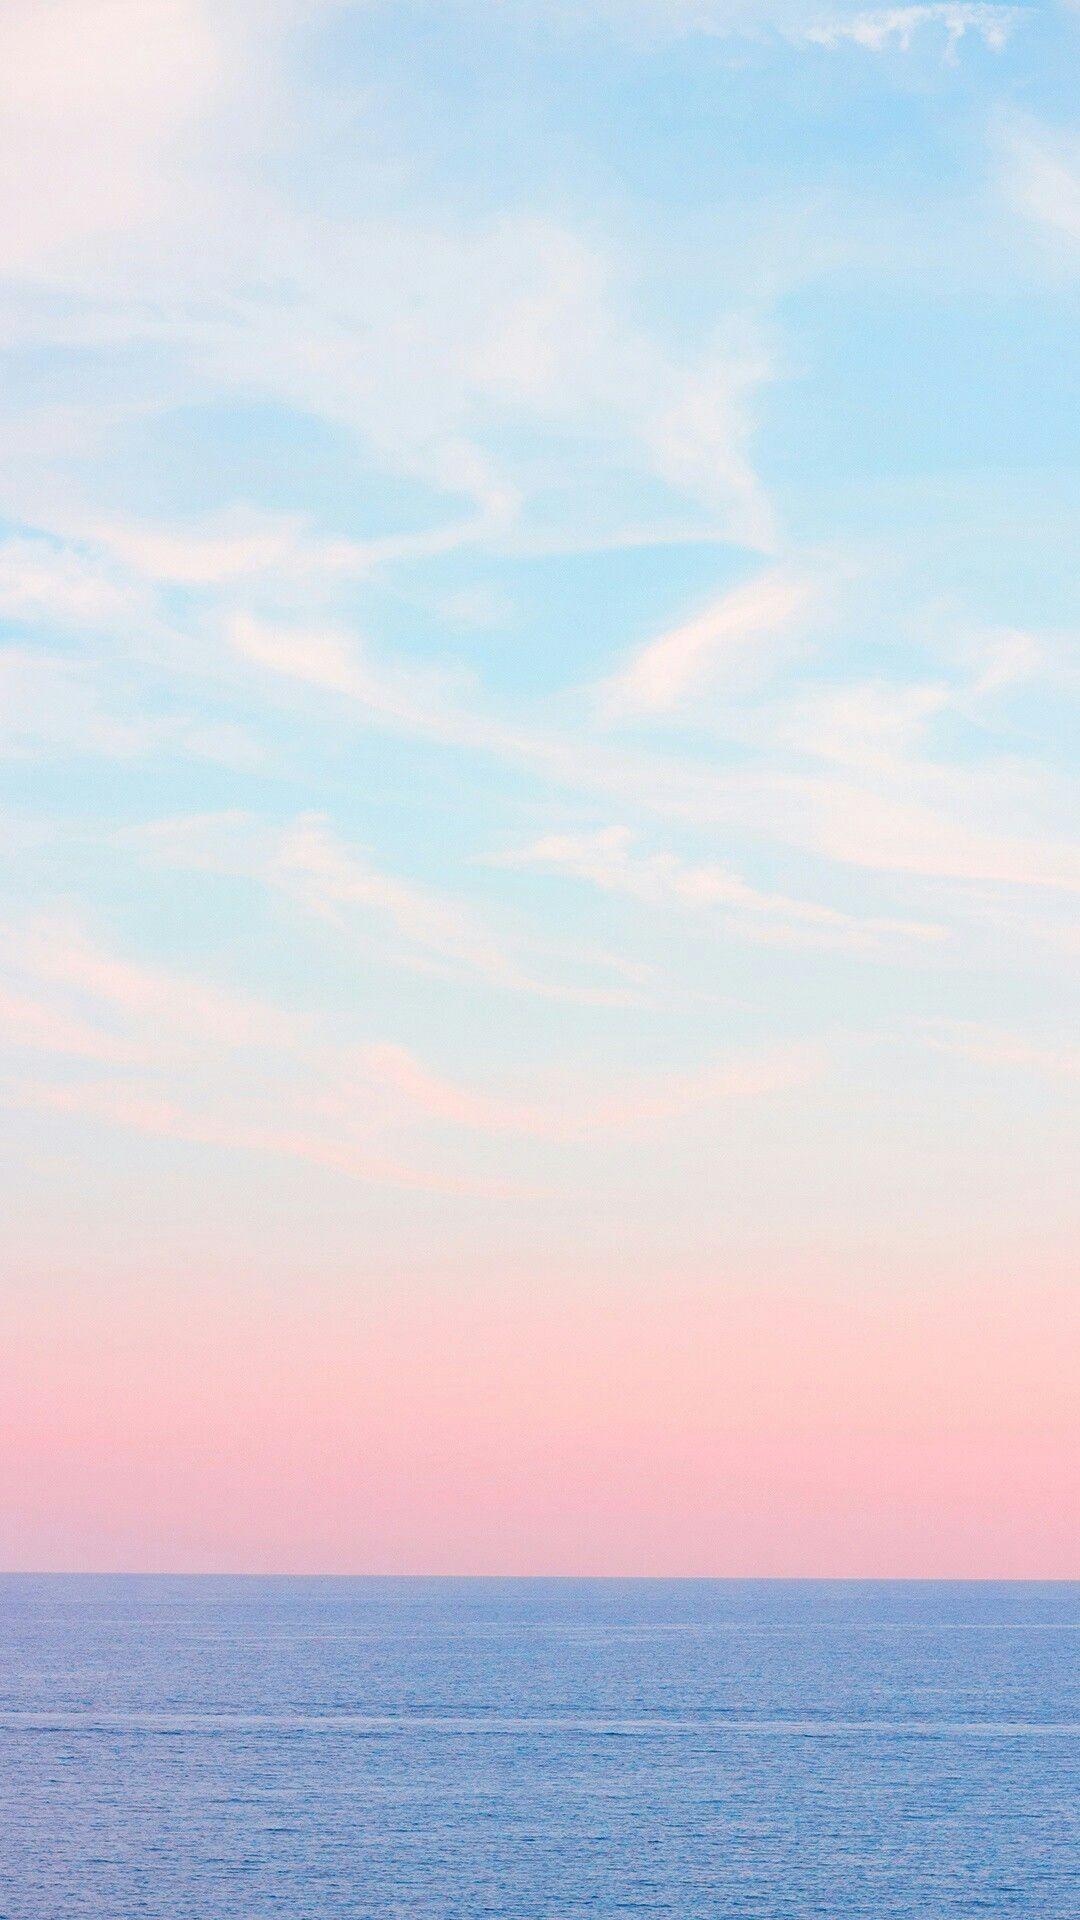 Aesthetic Instagram Bios Wattpad